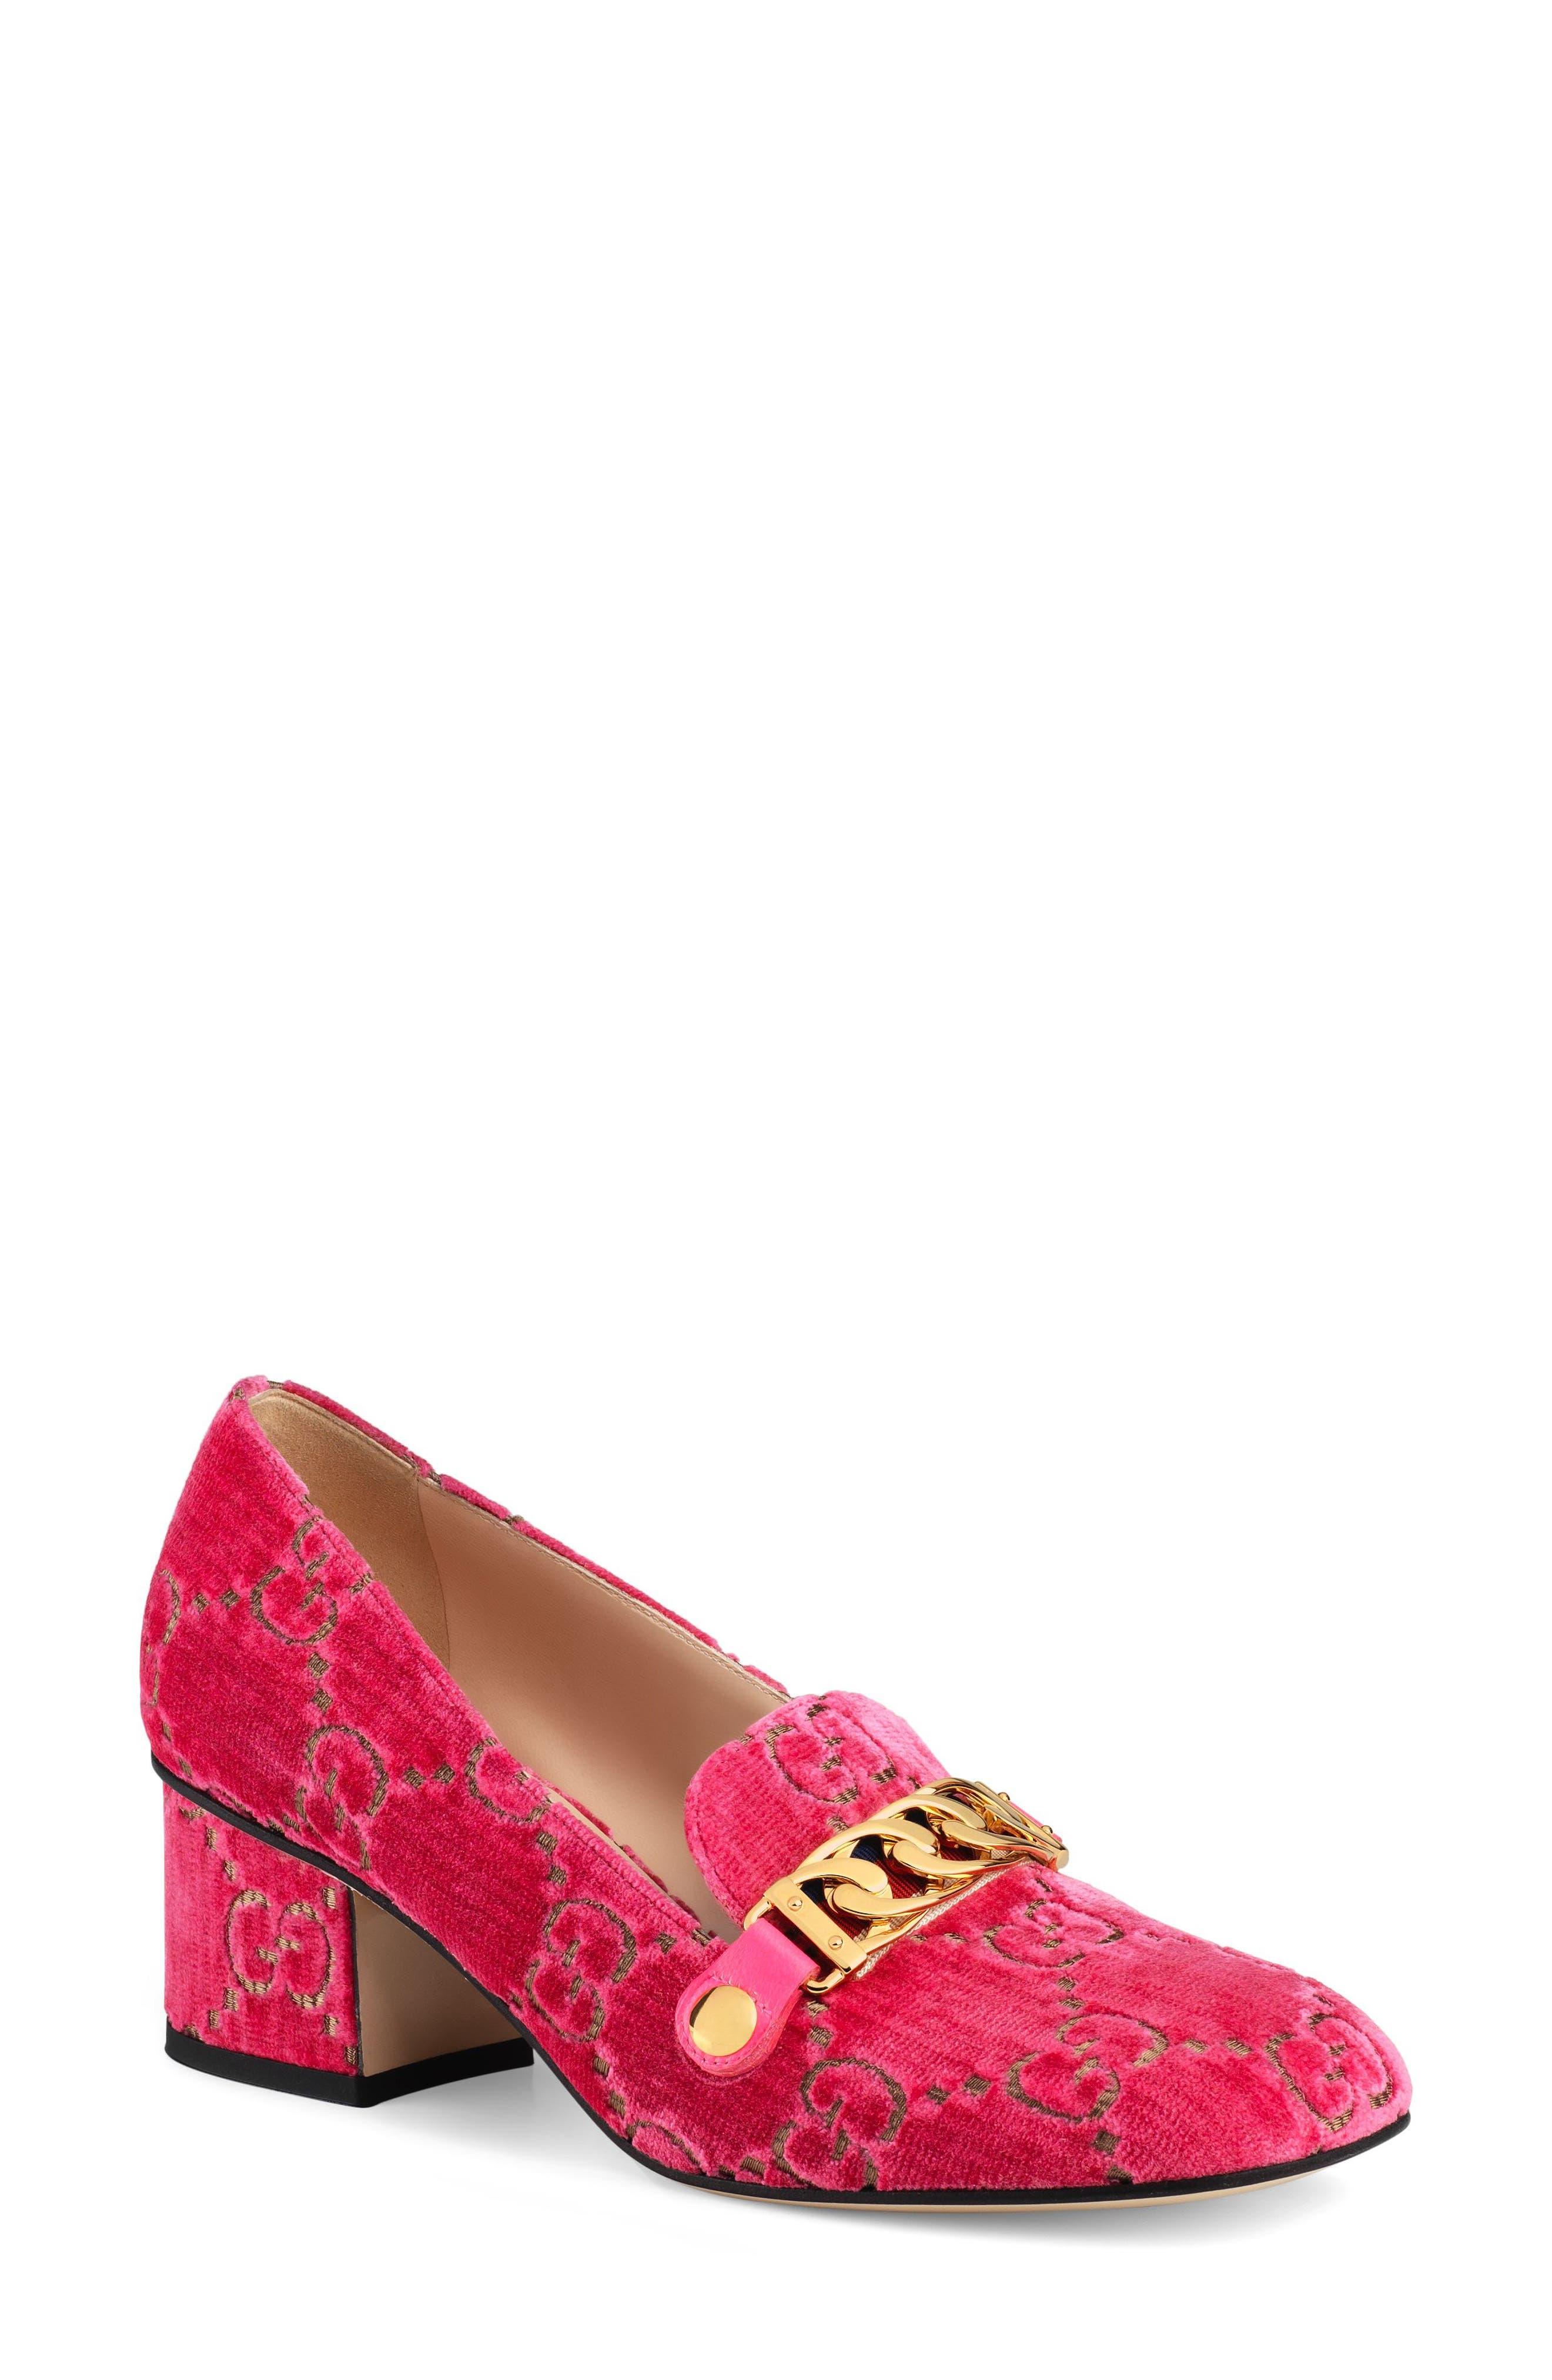 Gucci Sylvie Loafer Pump - Pink